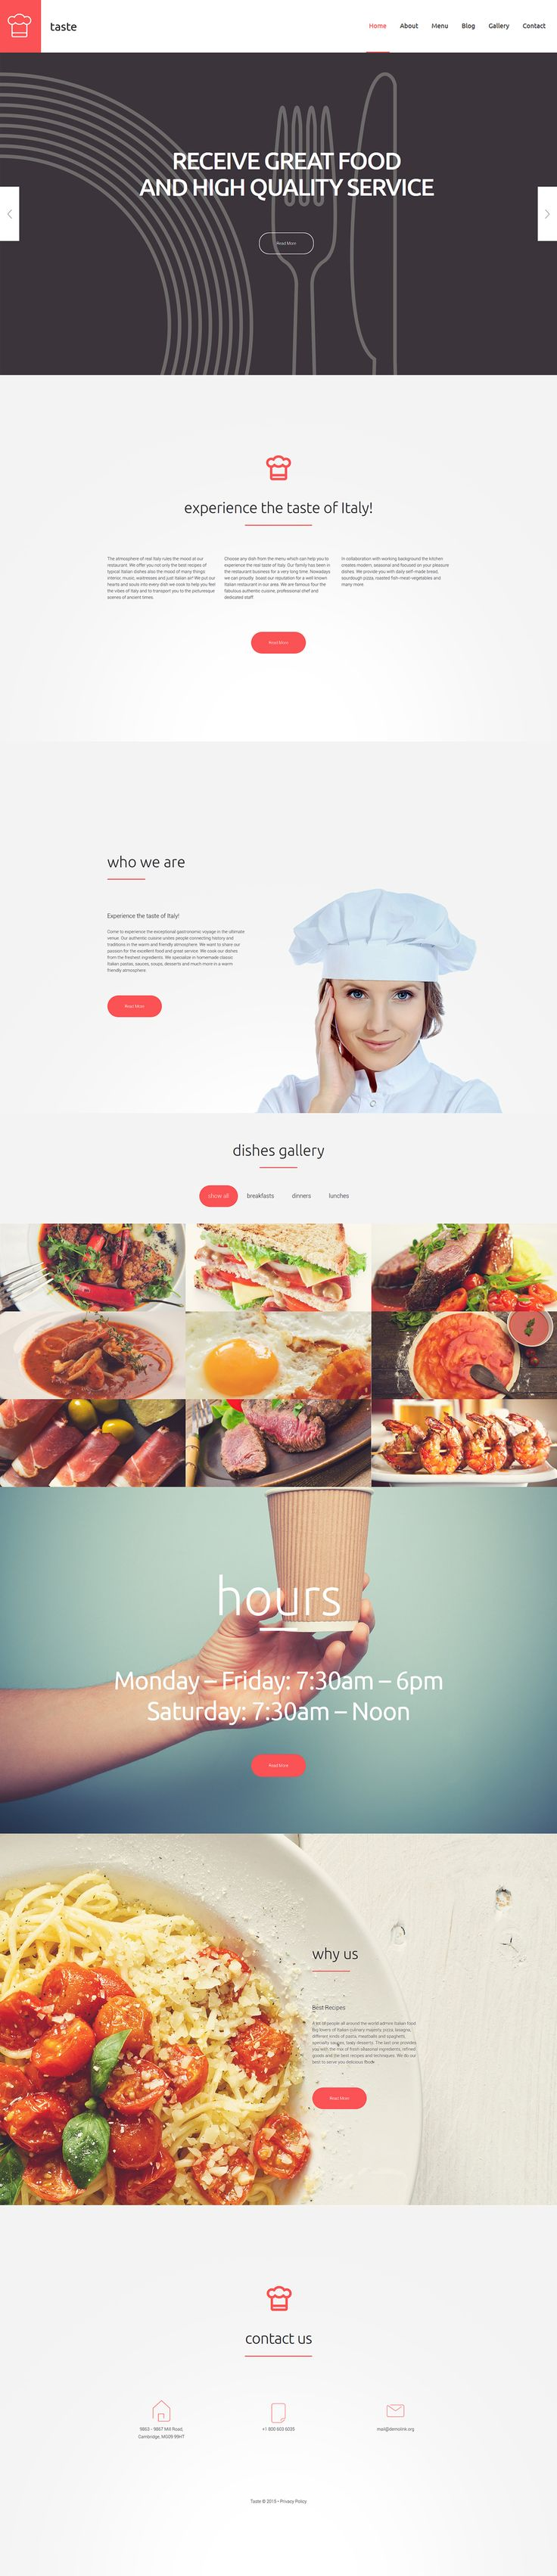 Catering WordPress Template for Restaurant Website #food #tasty  http://www.templatemonster.com/wordpress-themes/55690.html?utm_source=pinterest&utm_medium=timeline&utm_campaign=55690